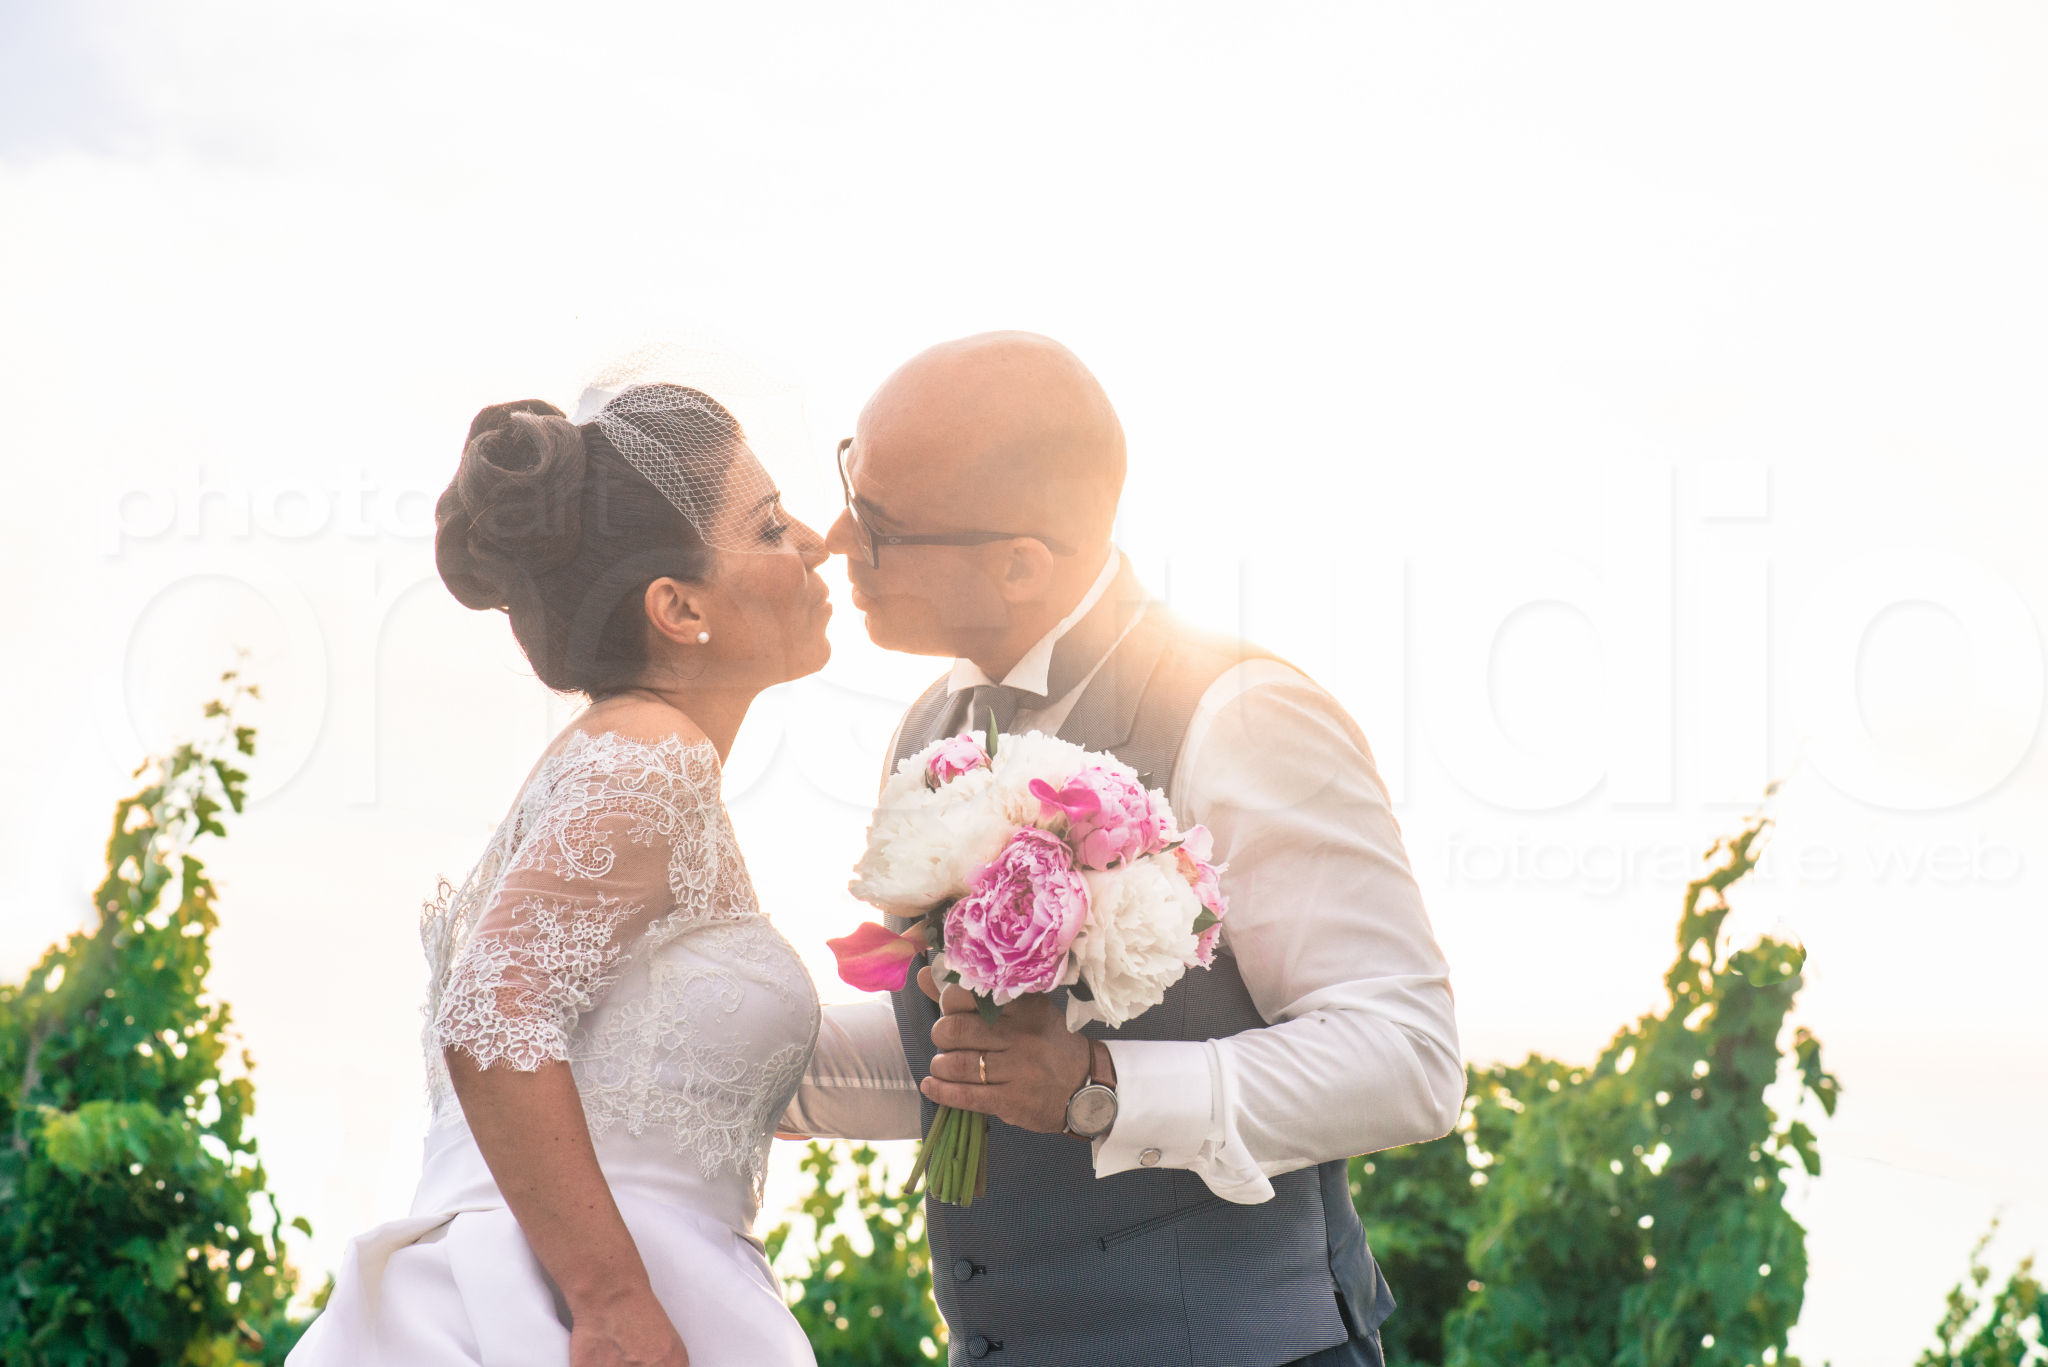 http://lnx.mirkone.it/wp-content/uploads/2015/07/fotografo-matrimoni-faenza-0009.jpg